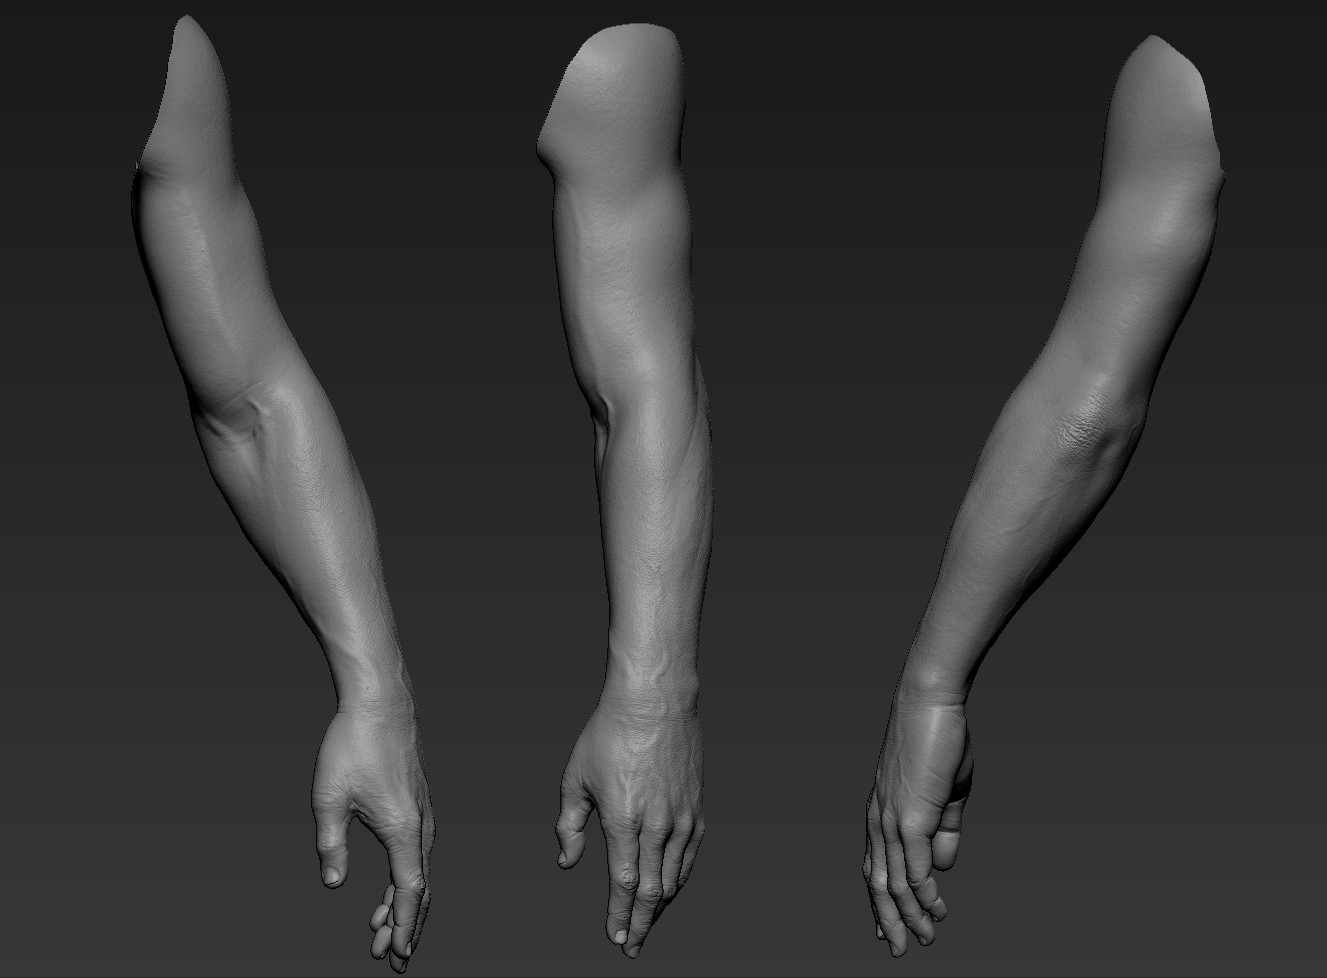 Andrey gritsuk hand 1